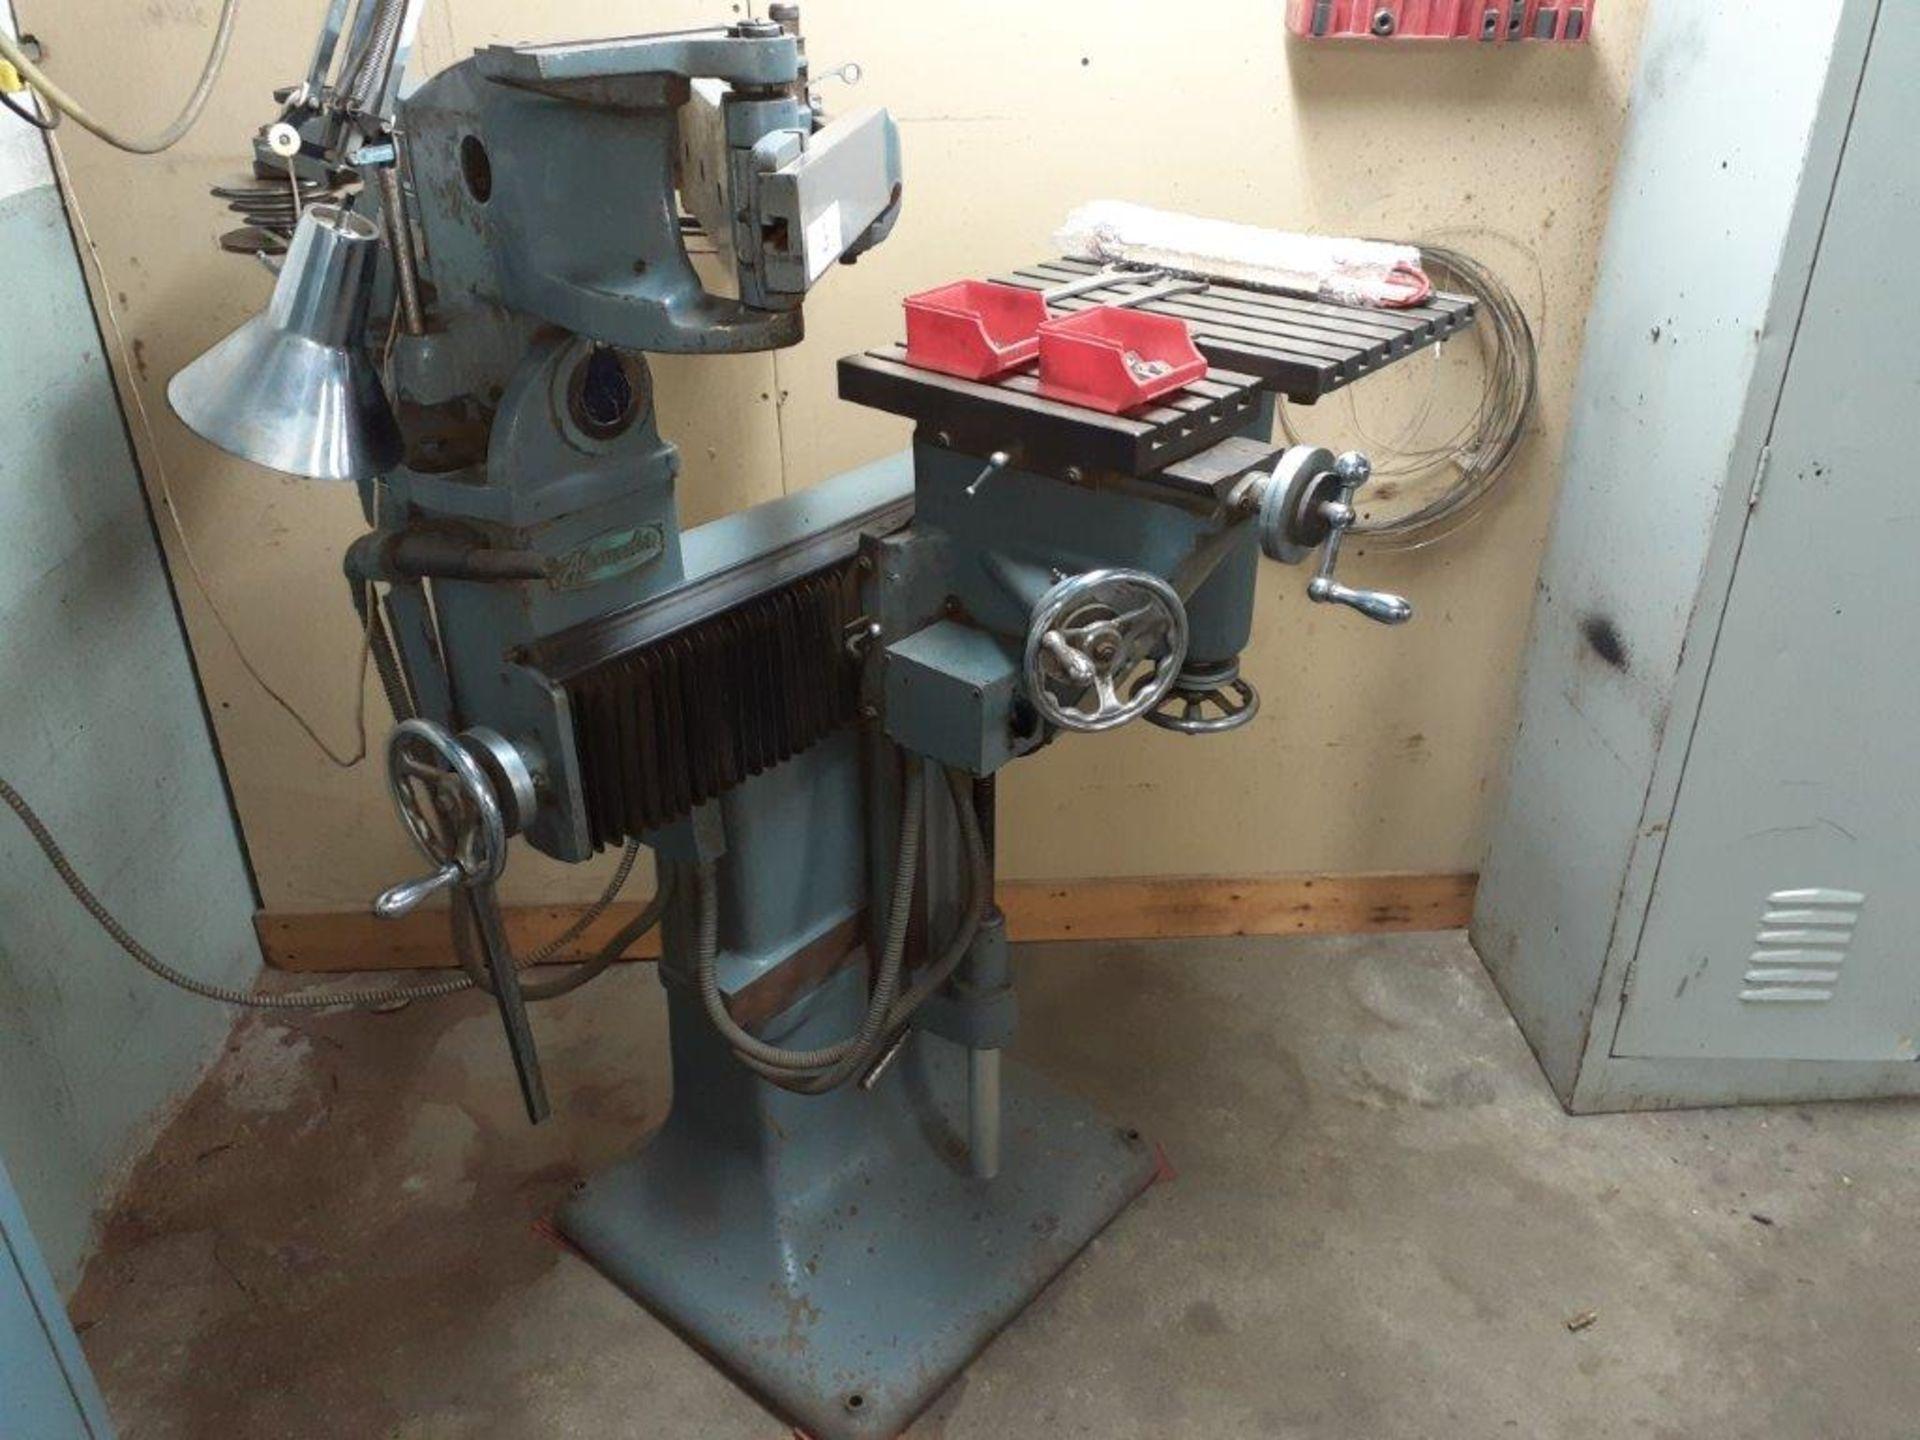 ALEXANDER PENTAGRAPH Machine, mod: 3A, c/w Metal Cabinet & Assorted Parts - Image 3 of 8